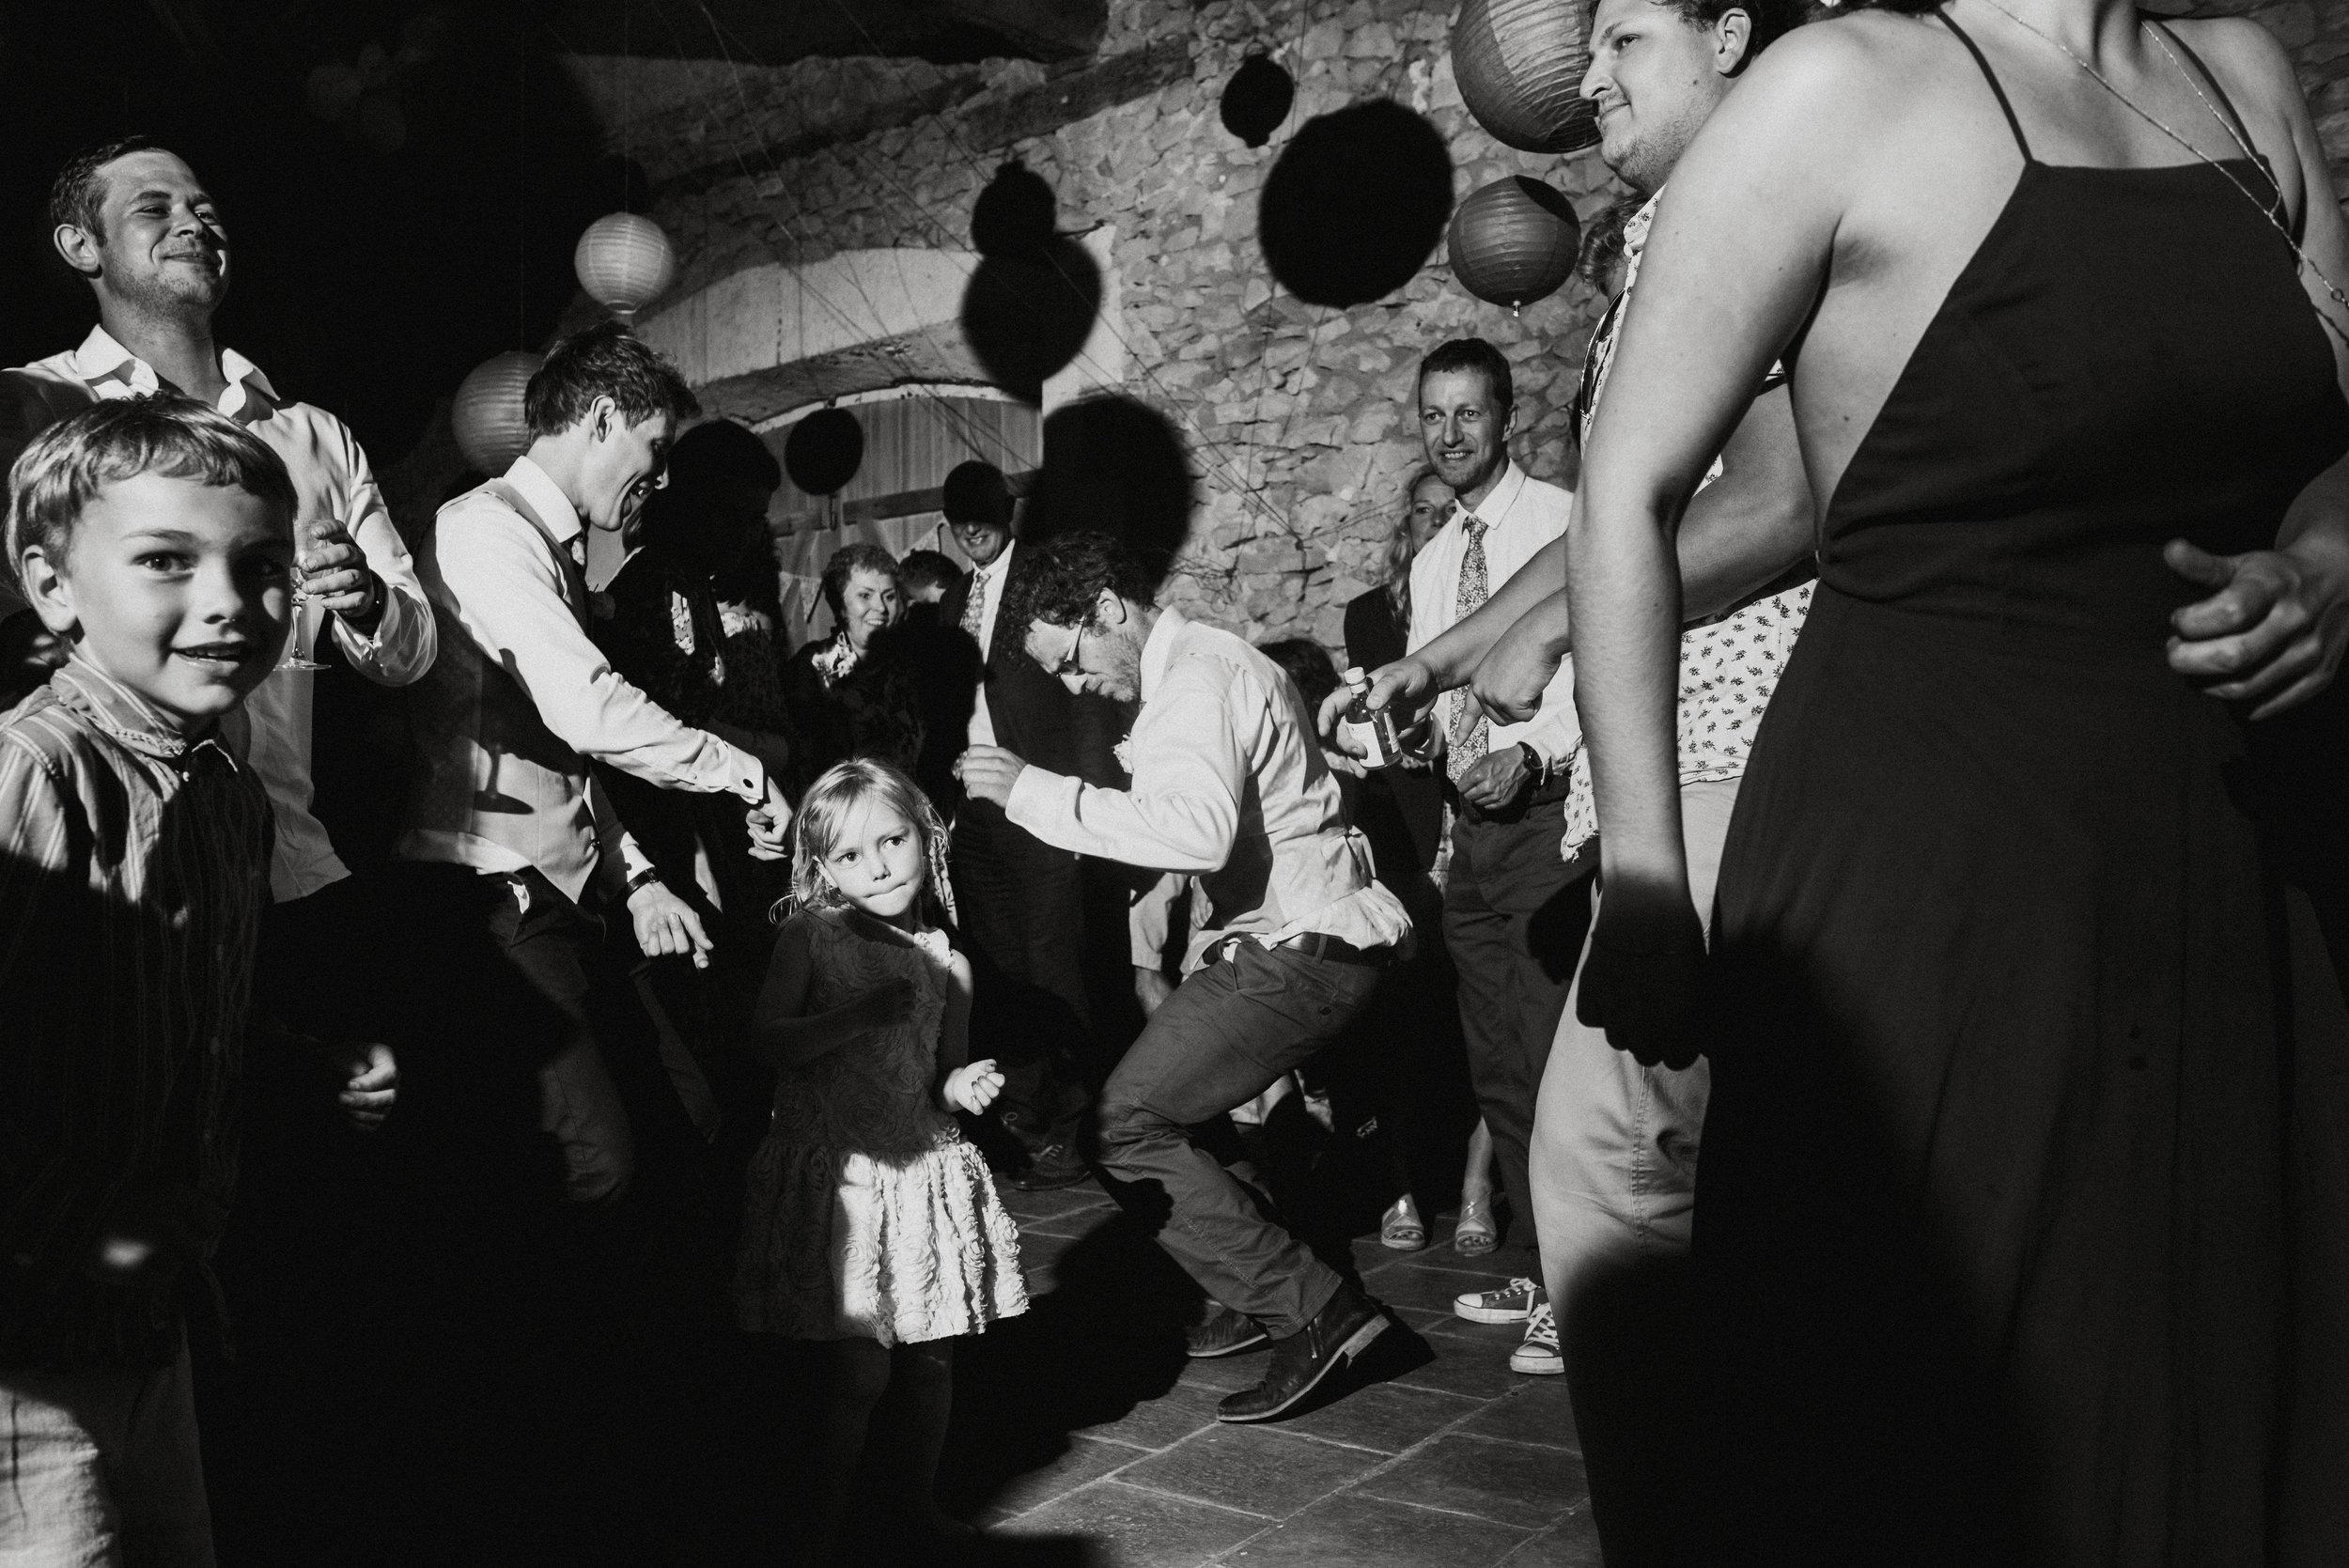 wedding-photographer-dordogne-mark-shaw-79.jpg